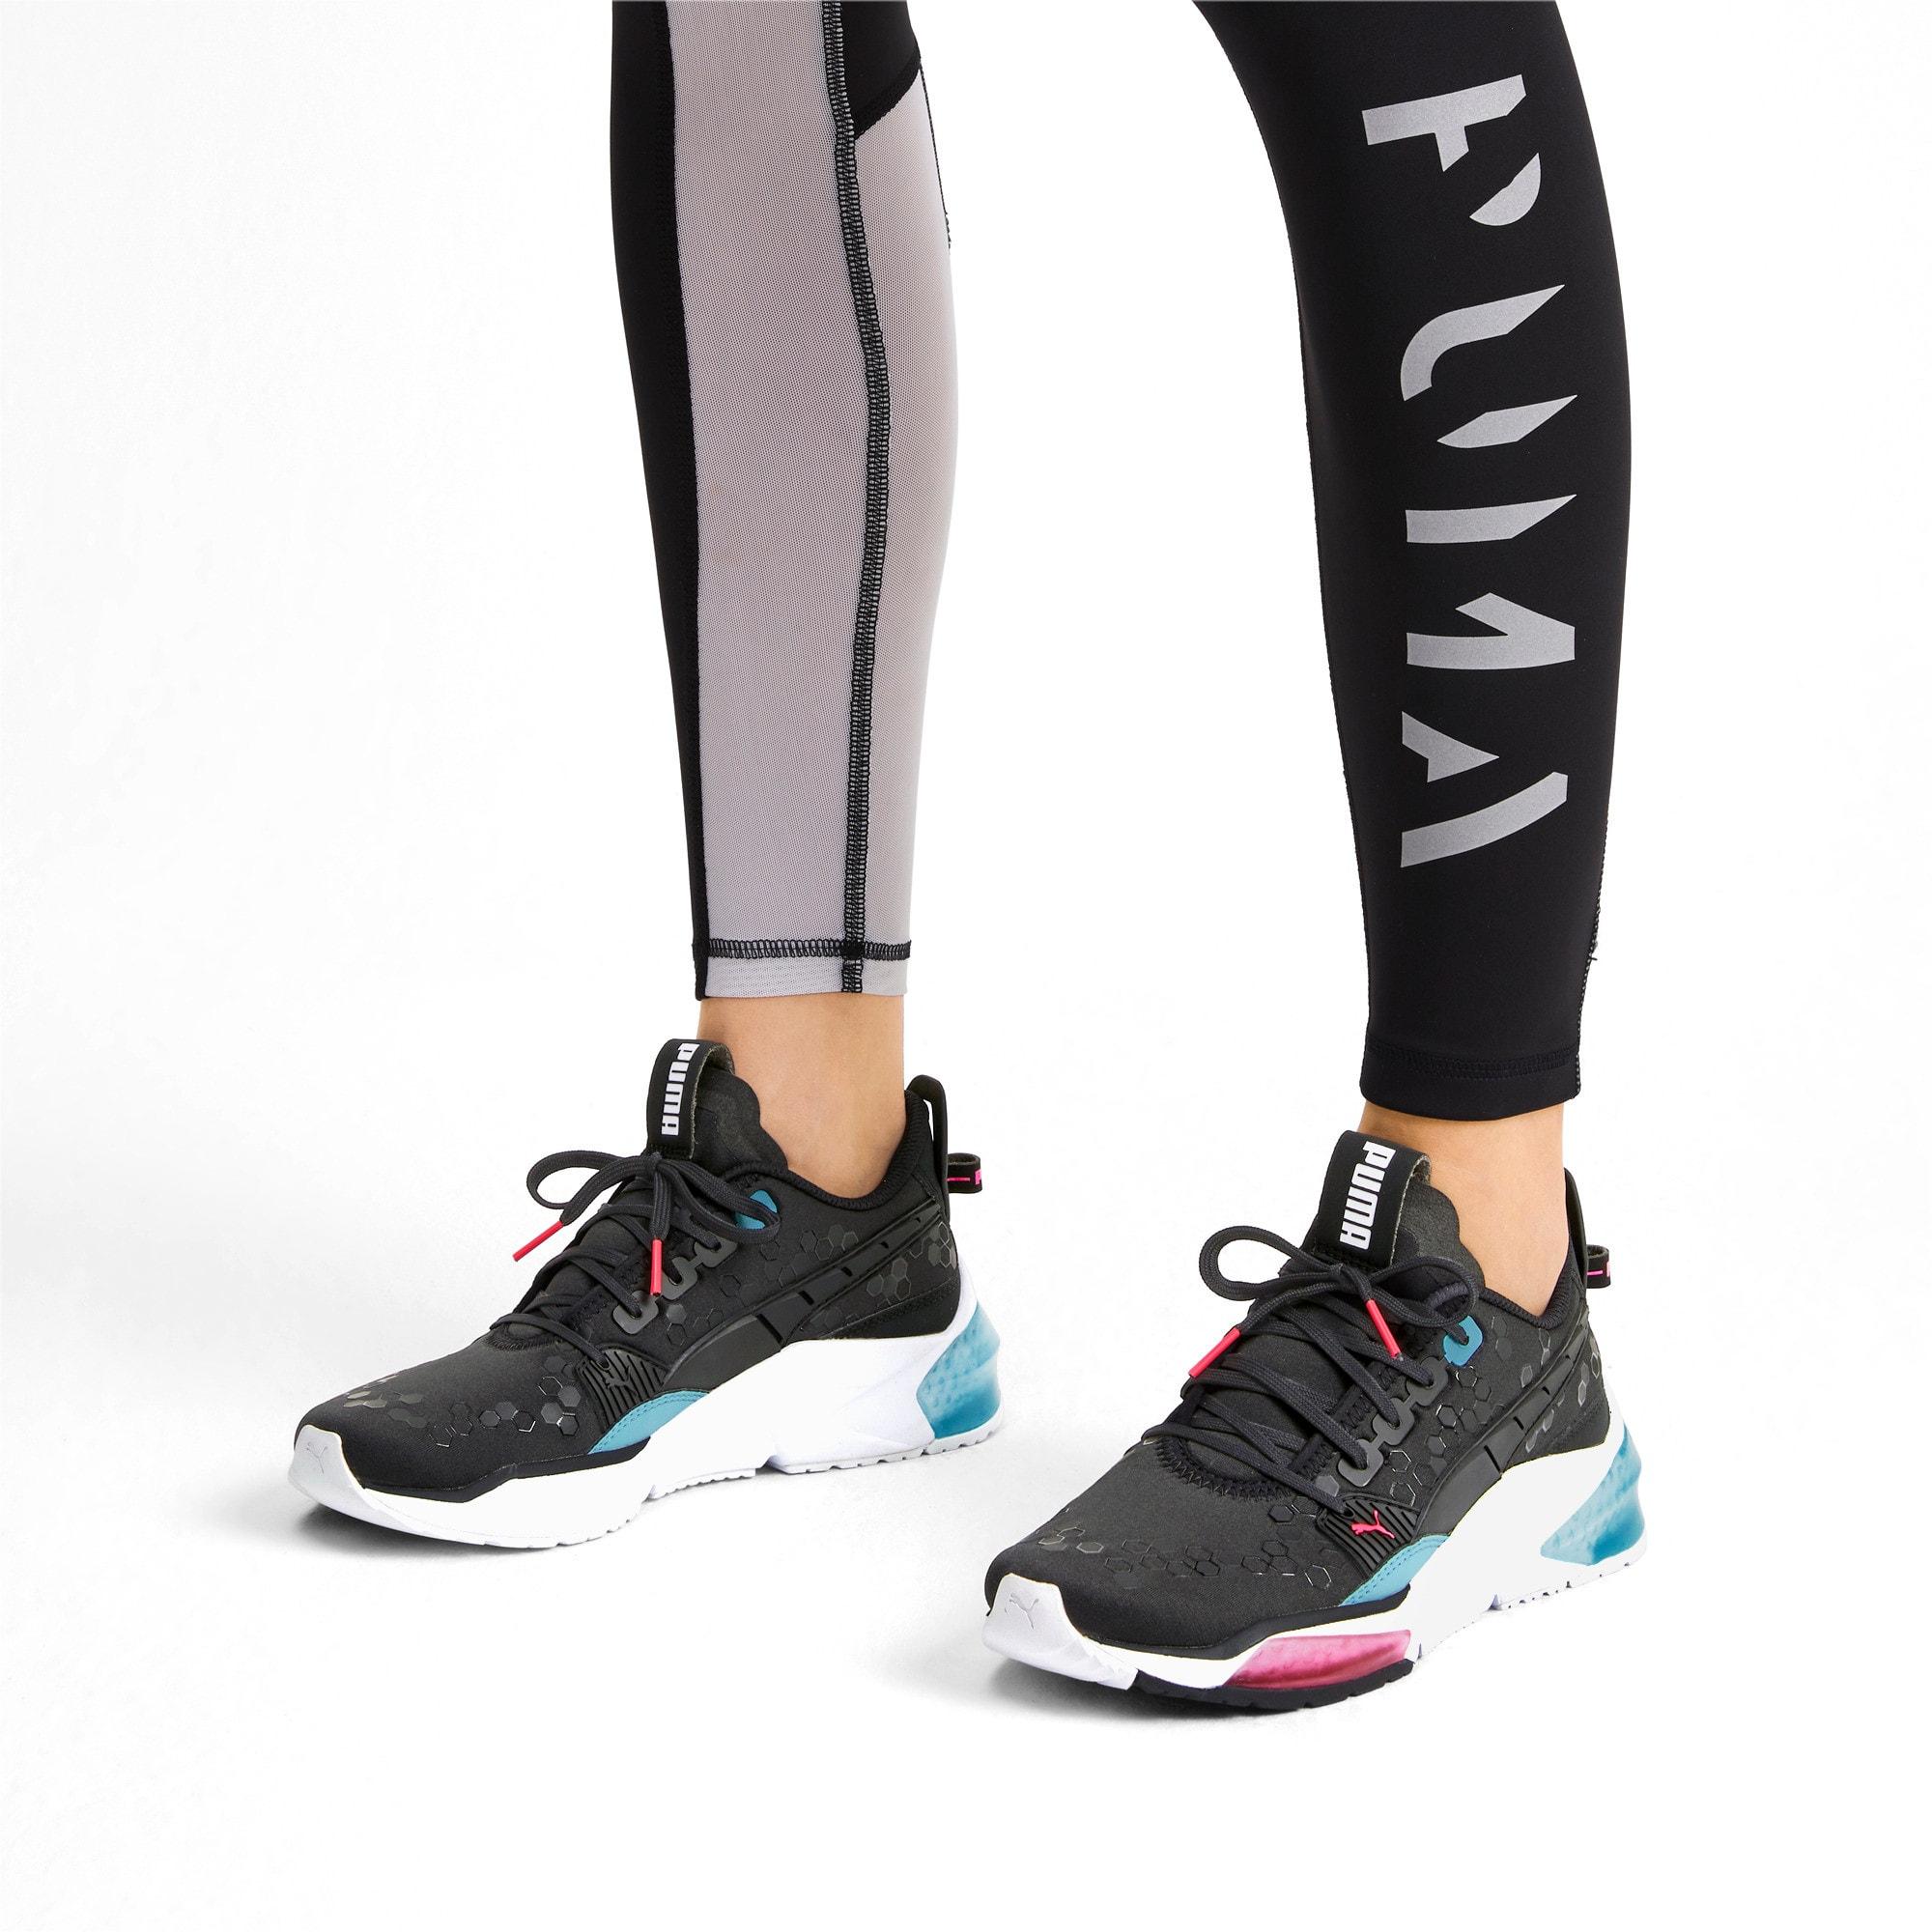 Thumbnail 2 of LQDCELL Optic Training Shoes, Puma Black-M Blue-Pink Alert, medium